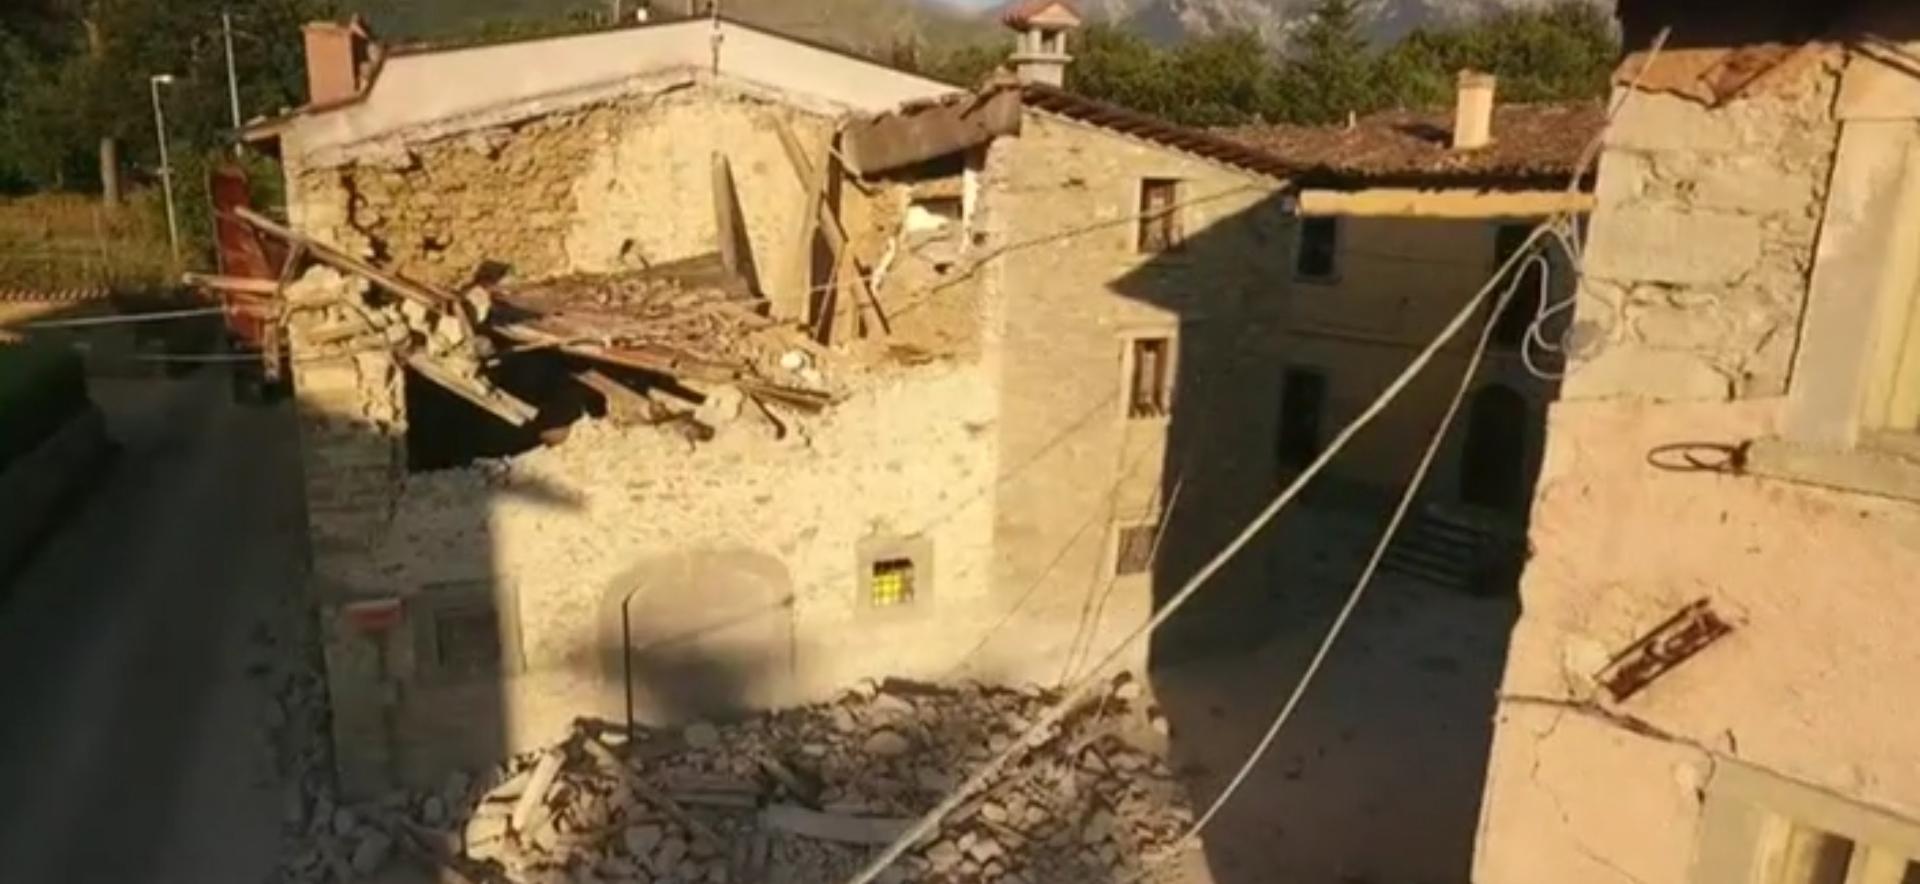 zemetrasenie 3